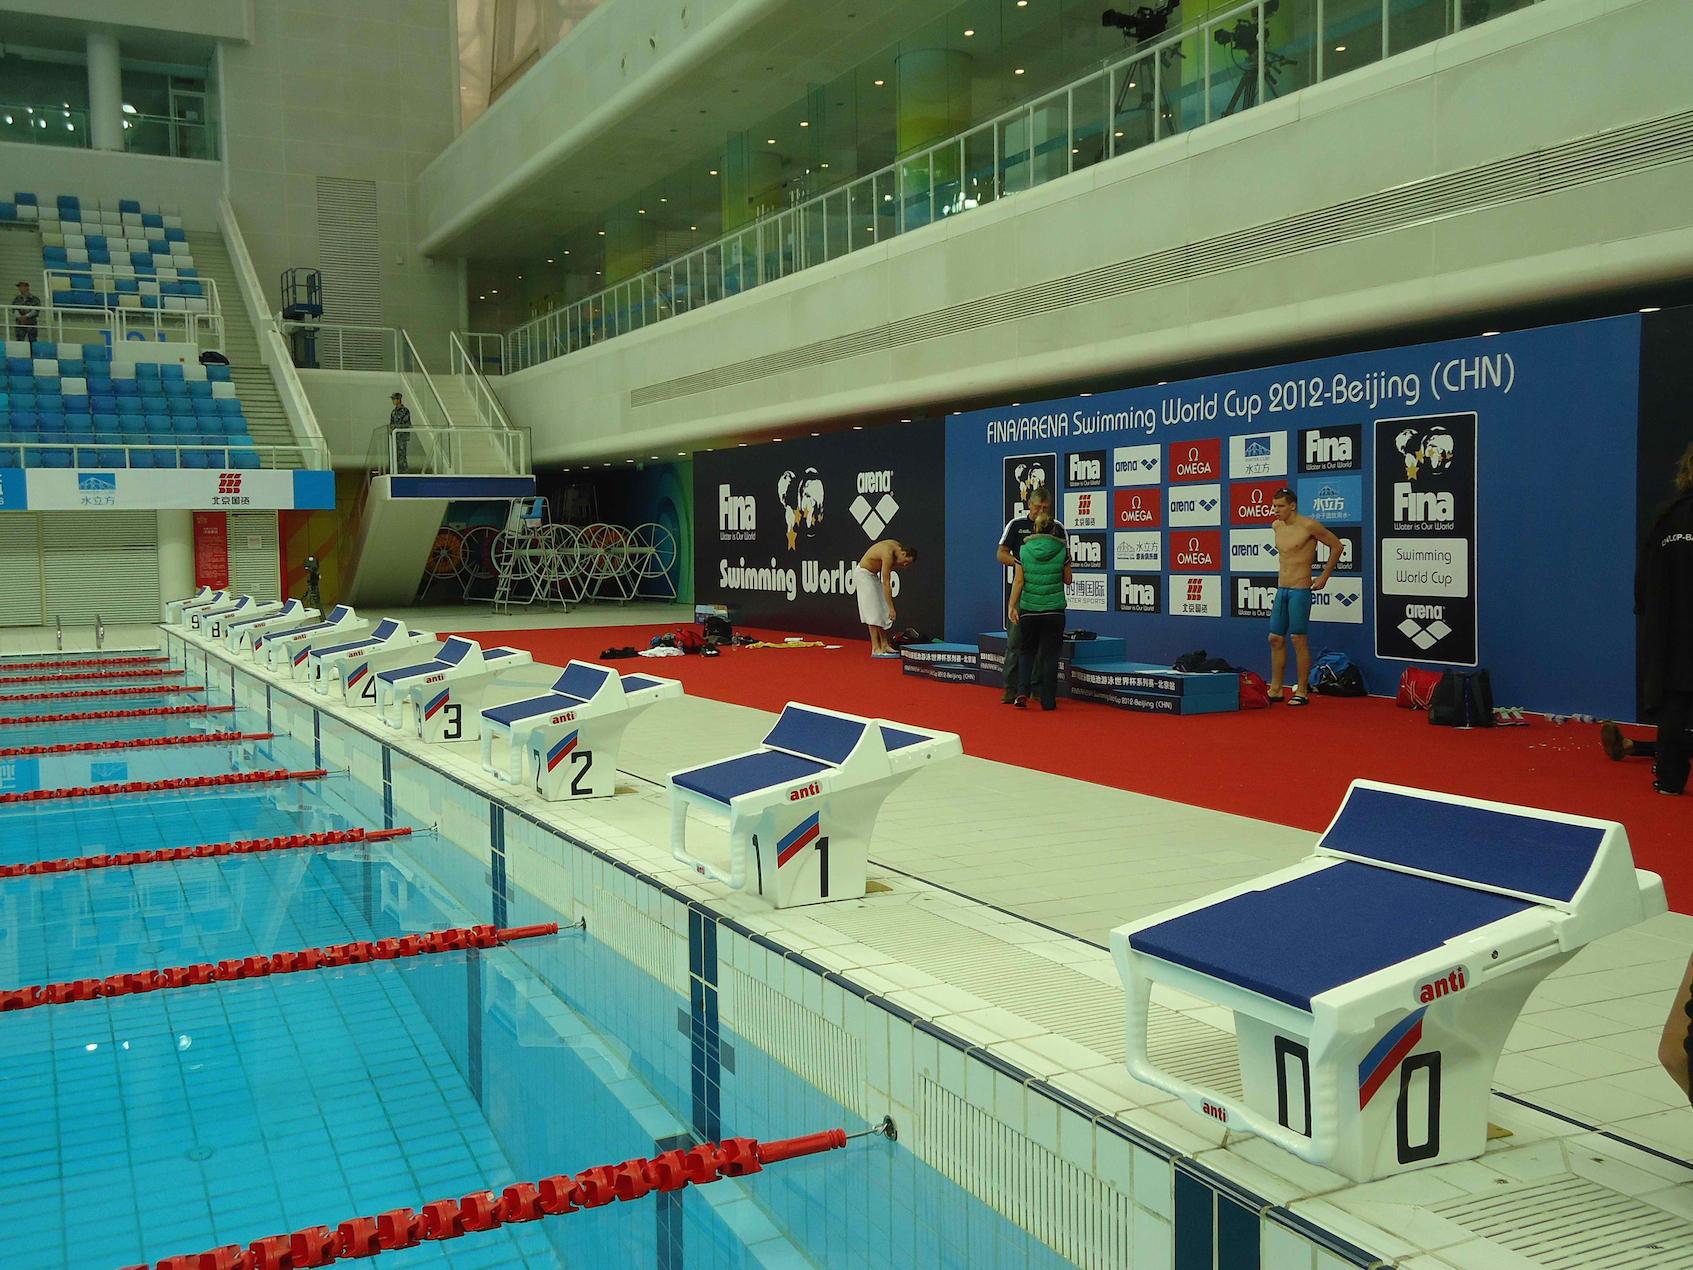 FINA World Cup Competition Swimming Venue